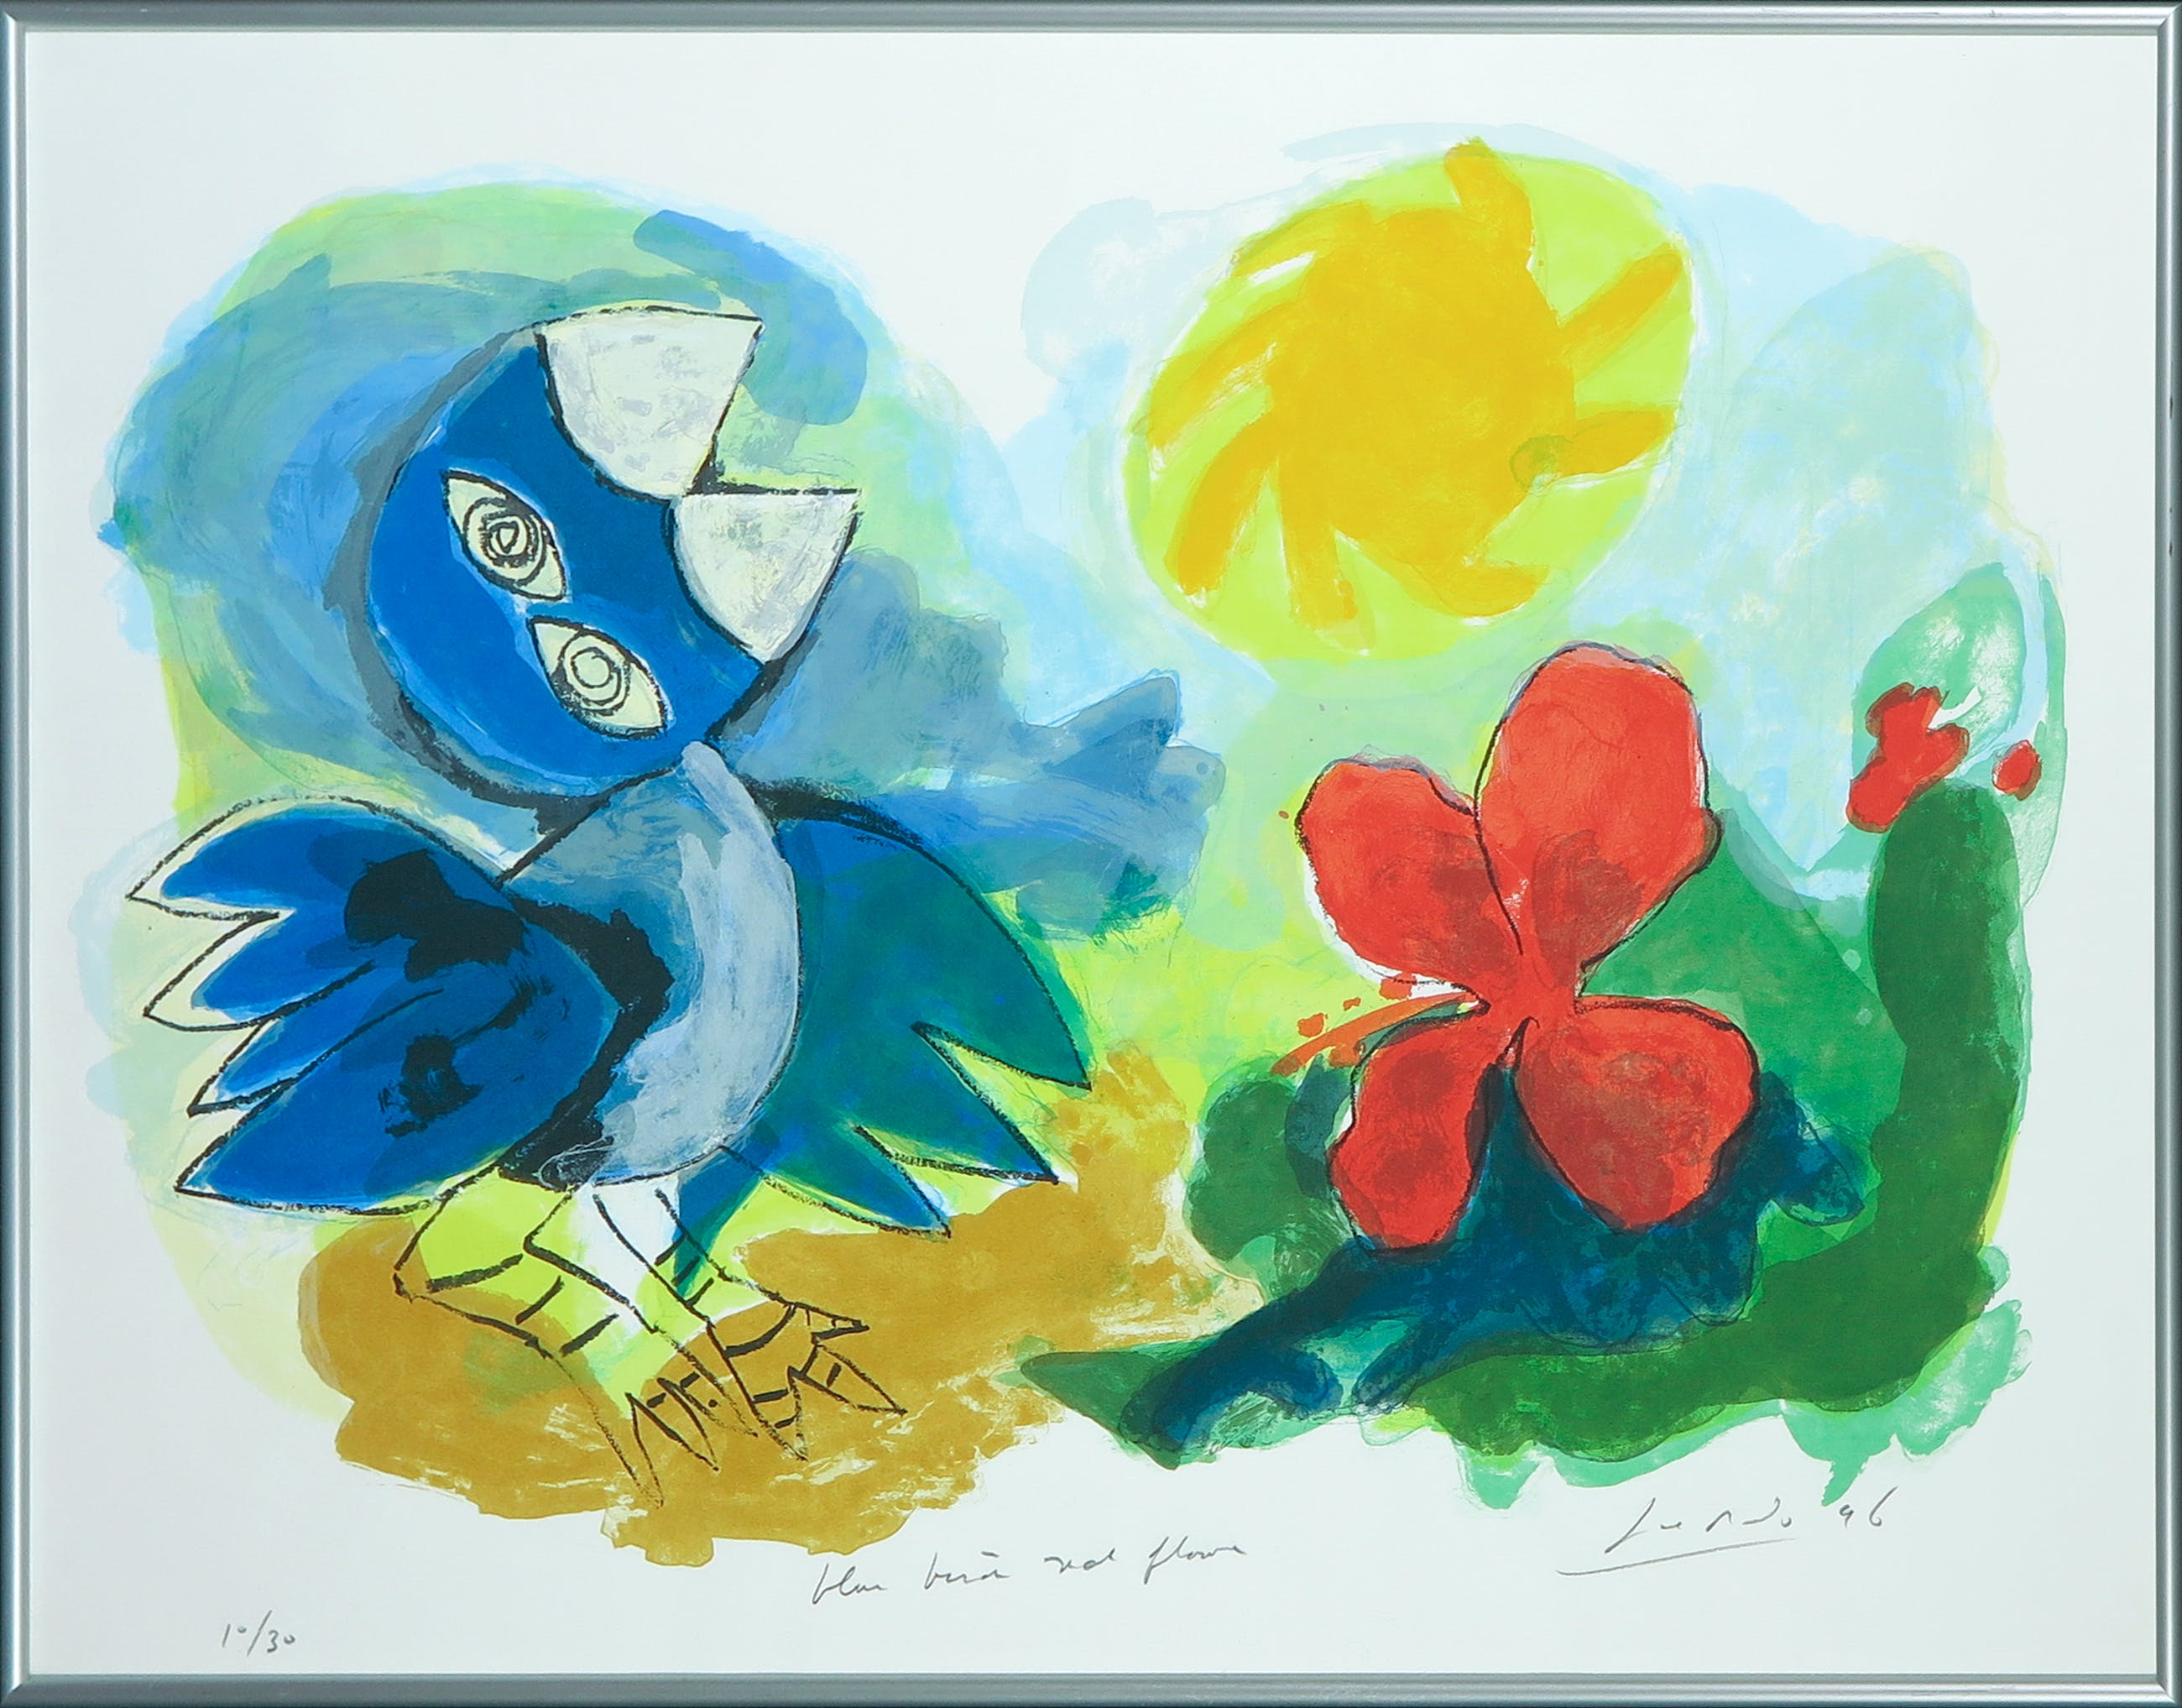 John Lie a Fo - Zeefdruk, Blue bird red flower - Ingelijst kopen? Bied vanaf 35!